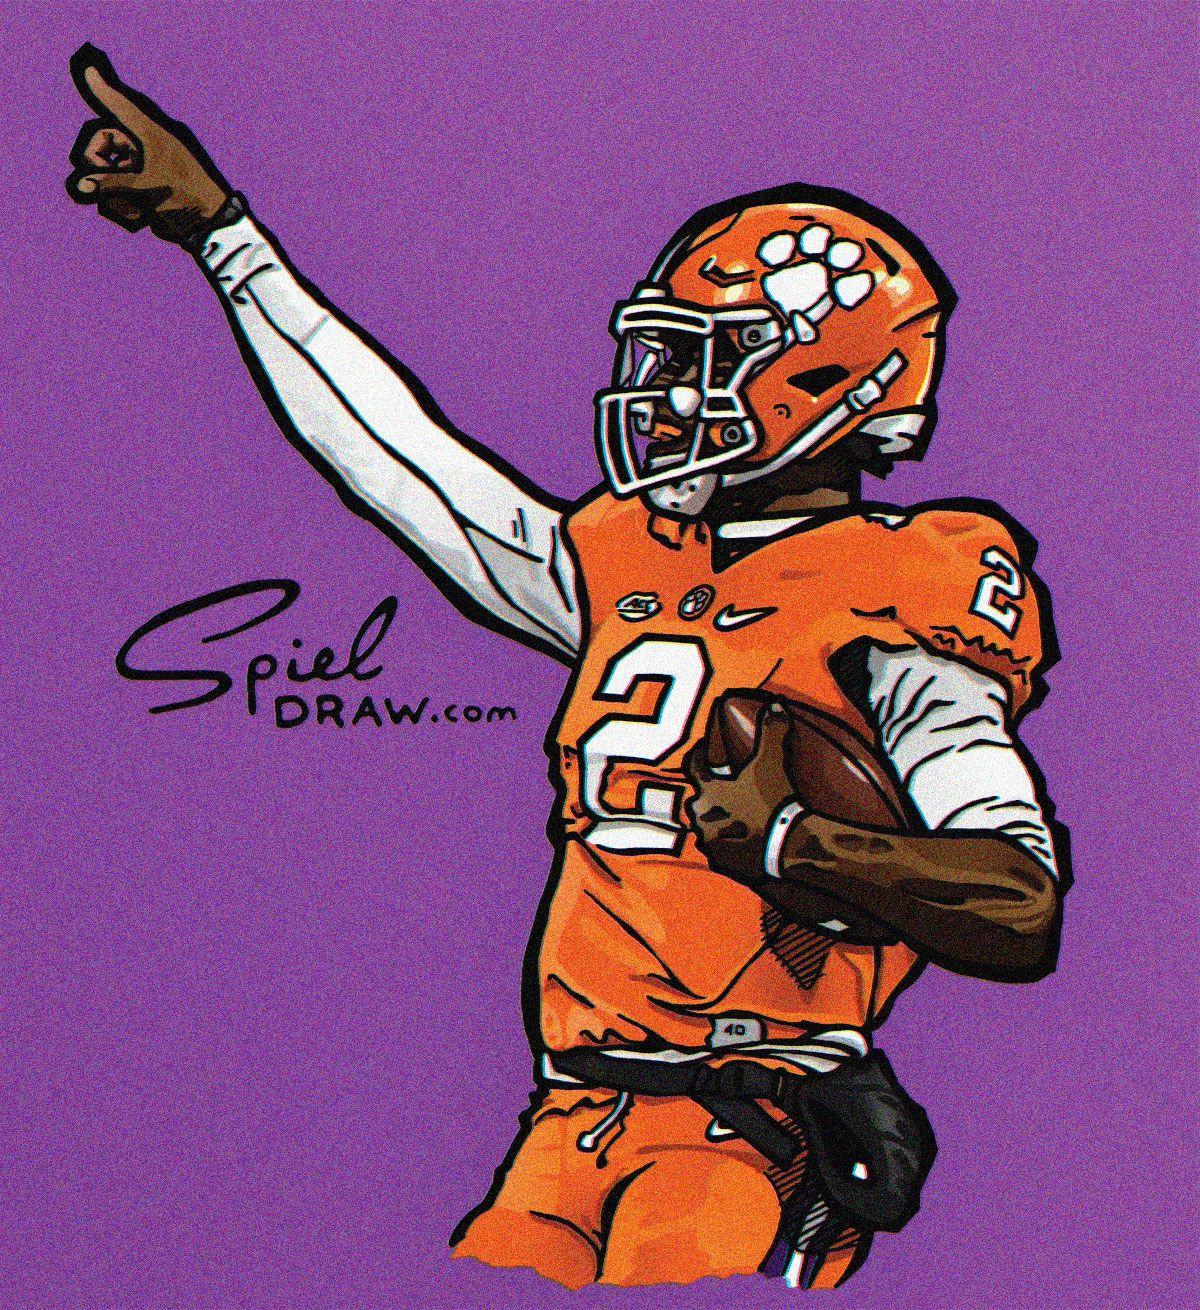 Digital Illustration Of Clemson Quarterback Kelly Bryant Created With Procreate And Ph Clemson Tigers Football Clemson University Football Lsu Tigers Football